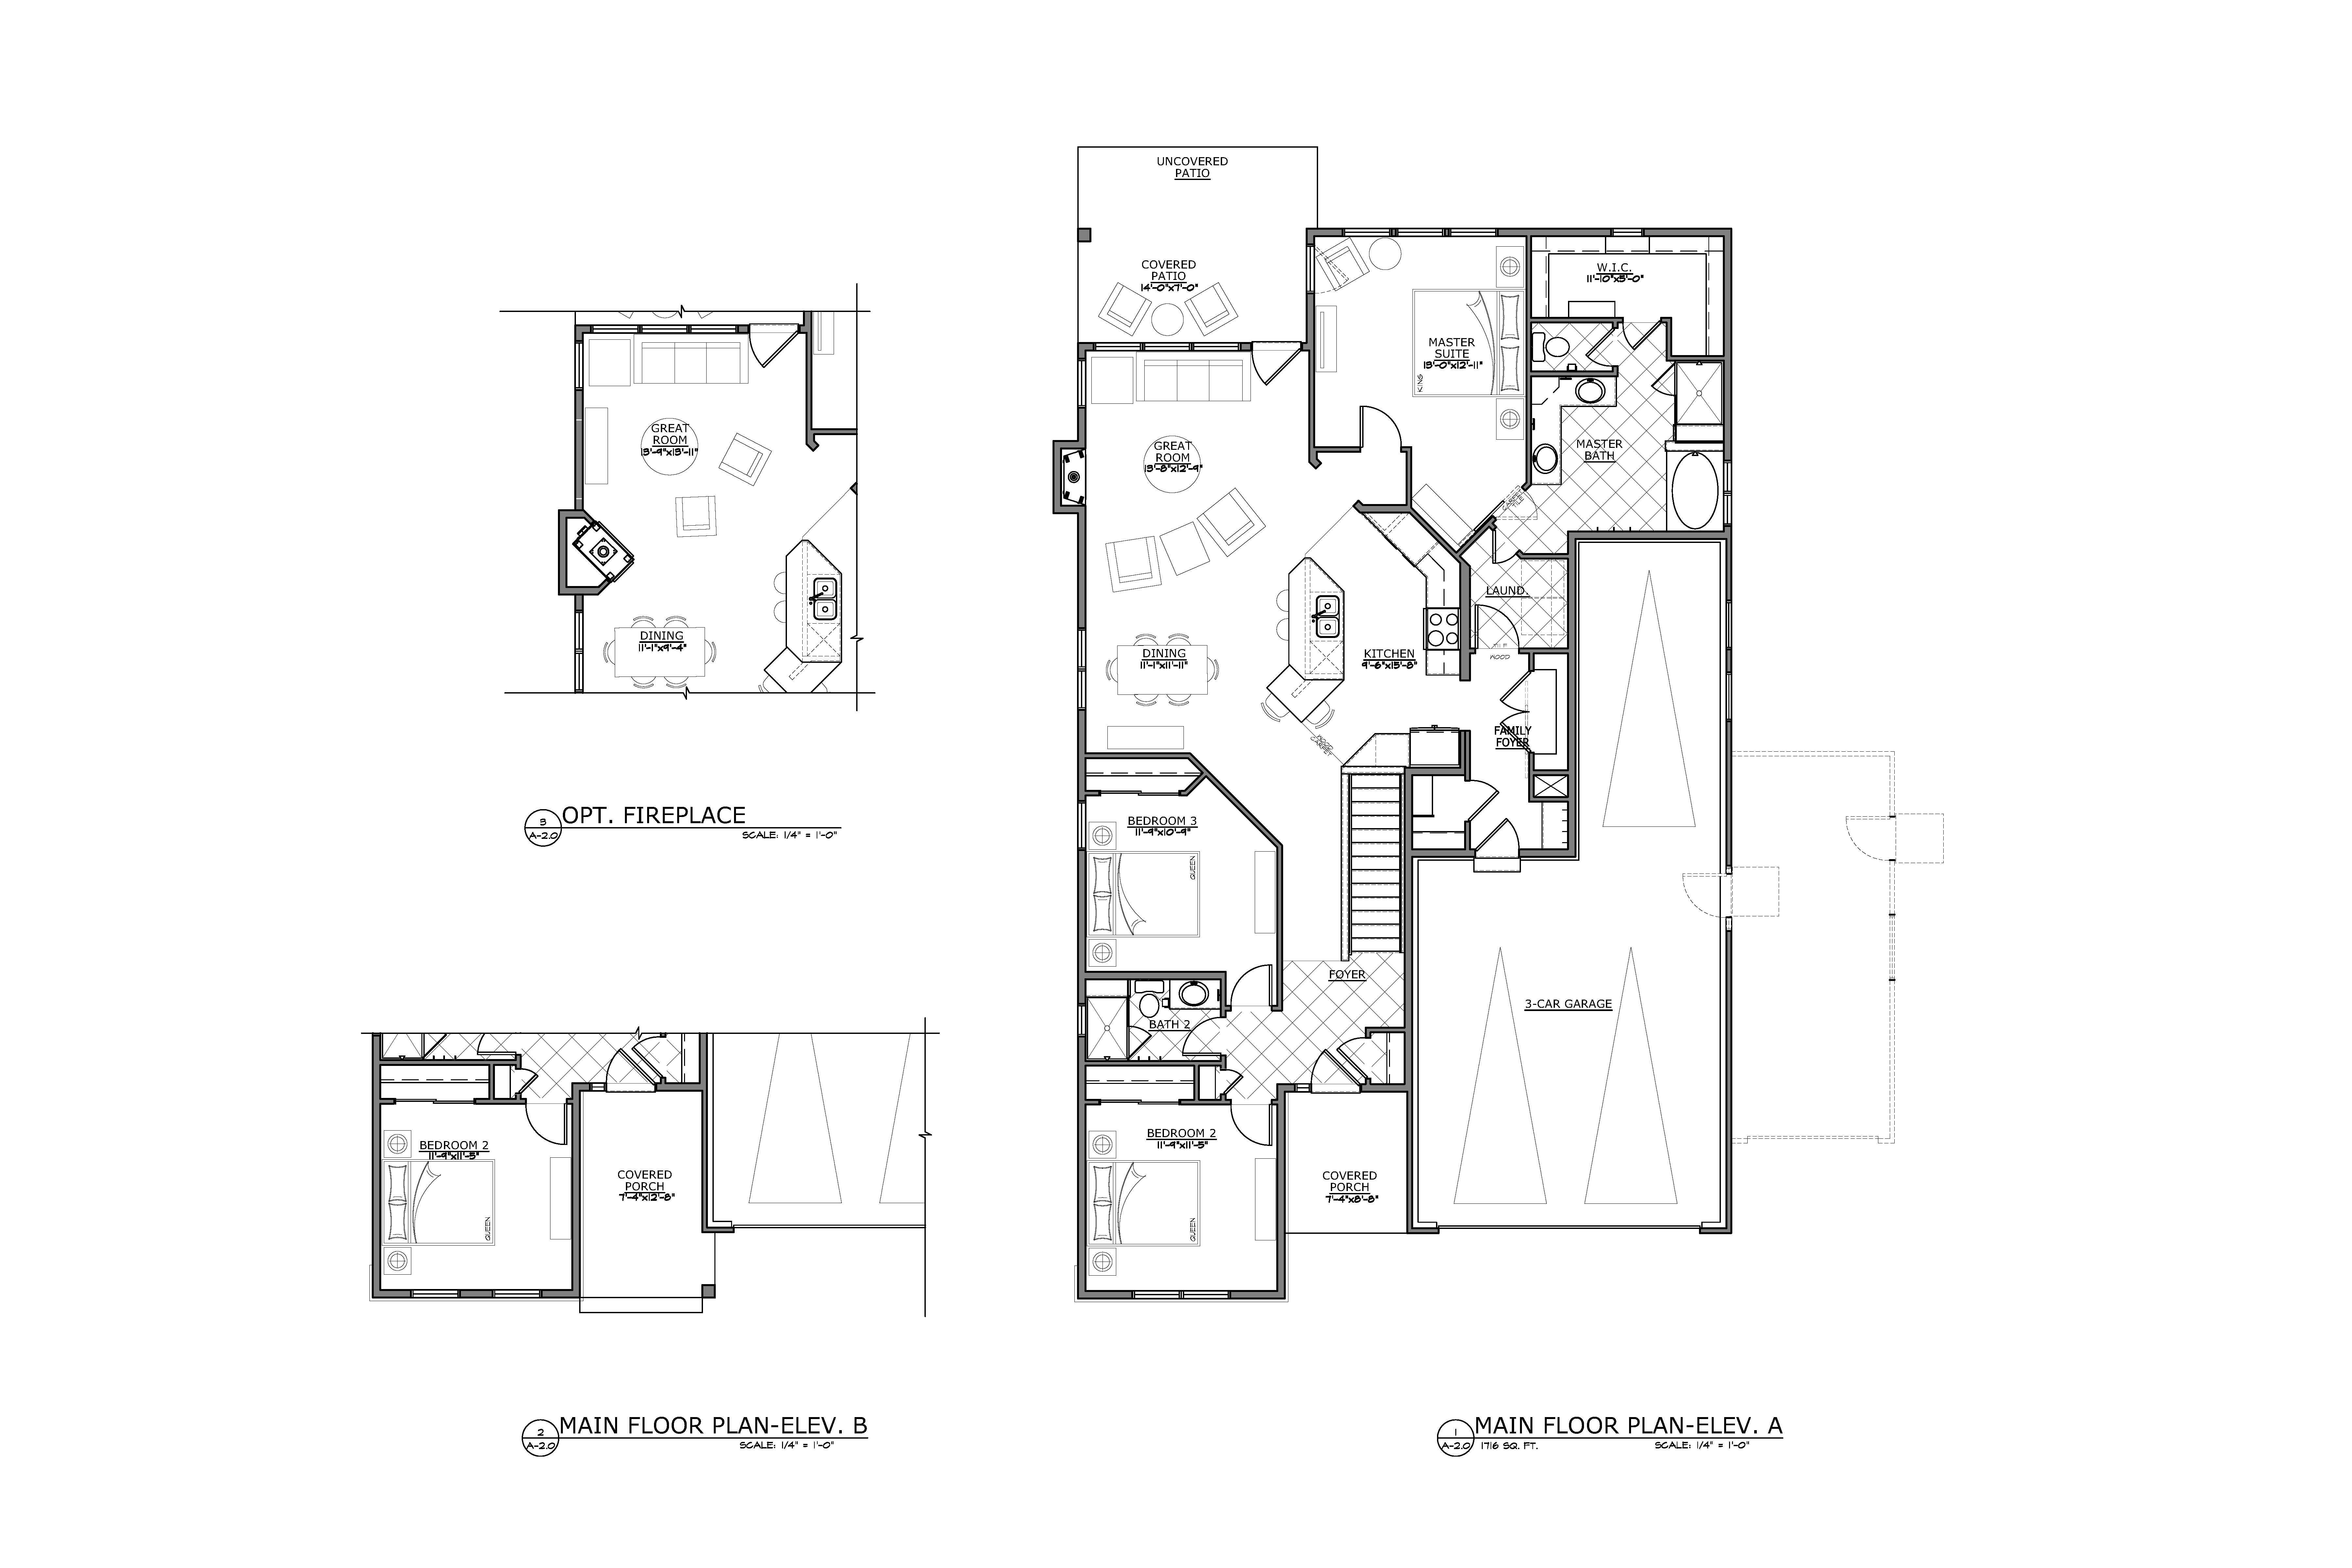 03_tabernash_main_floor_plan